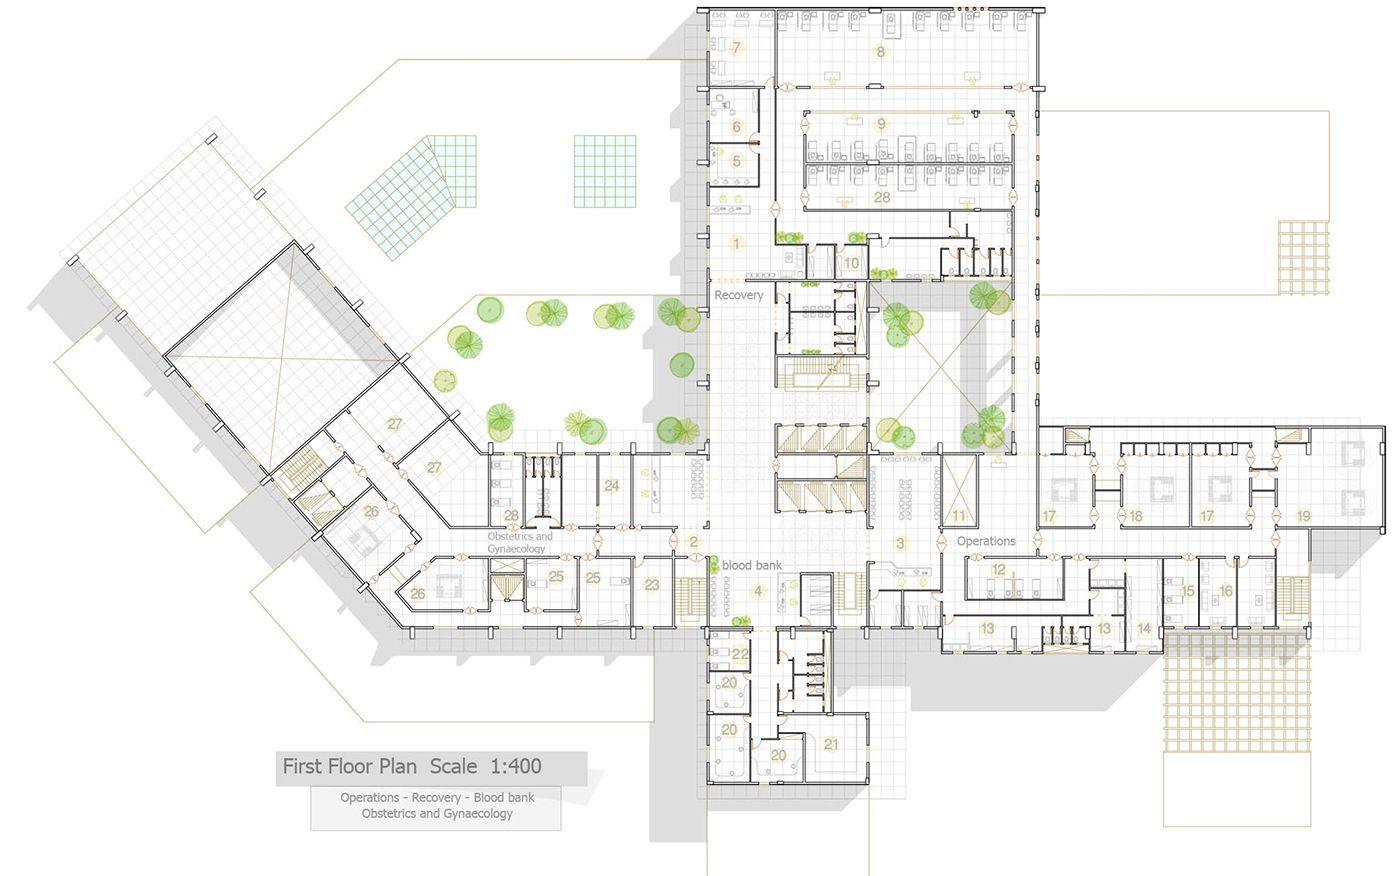 General Hospital First Floor Plan